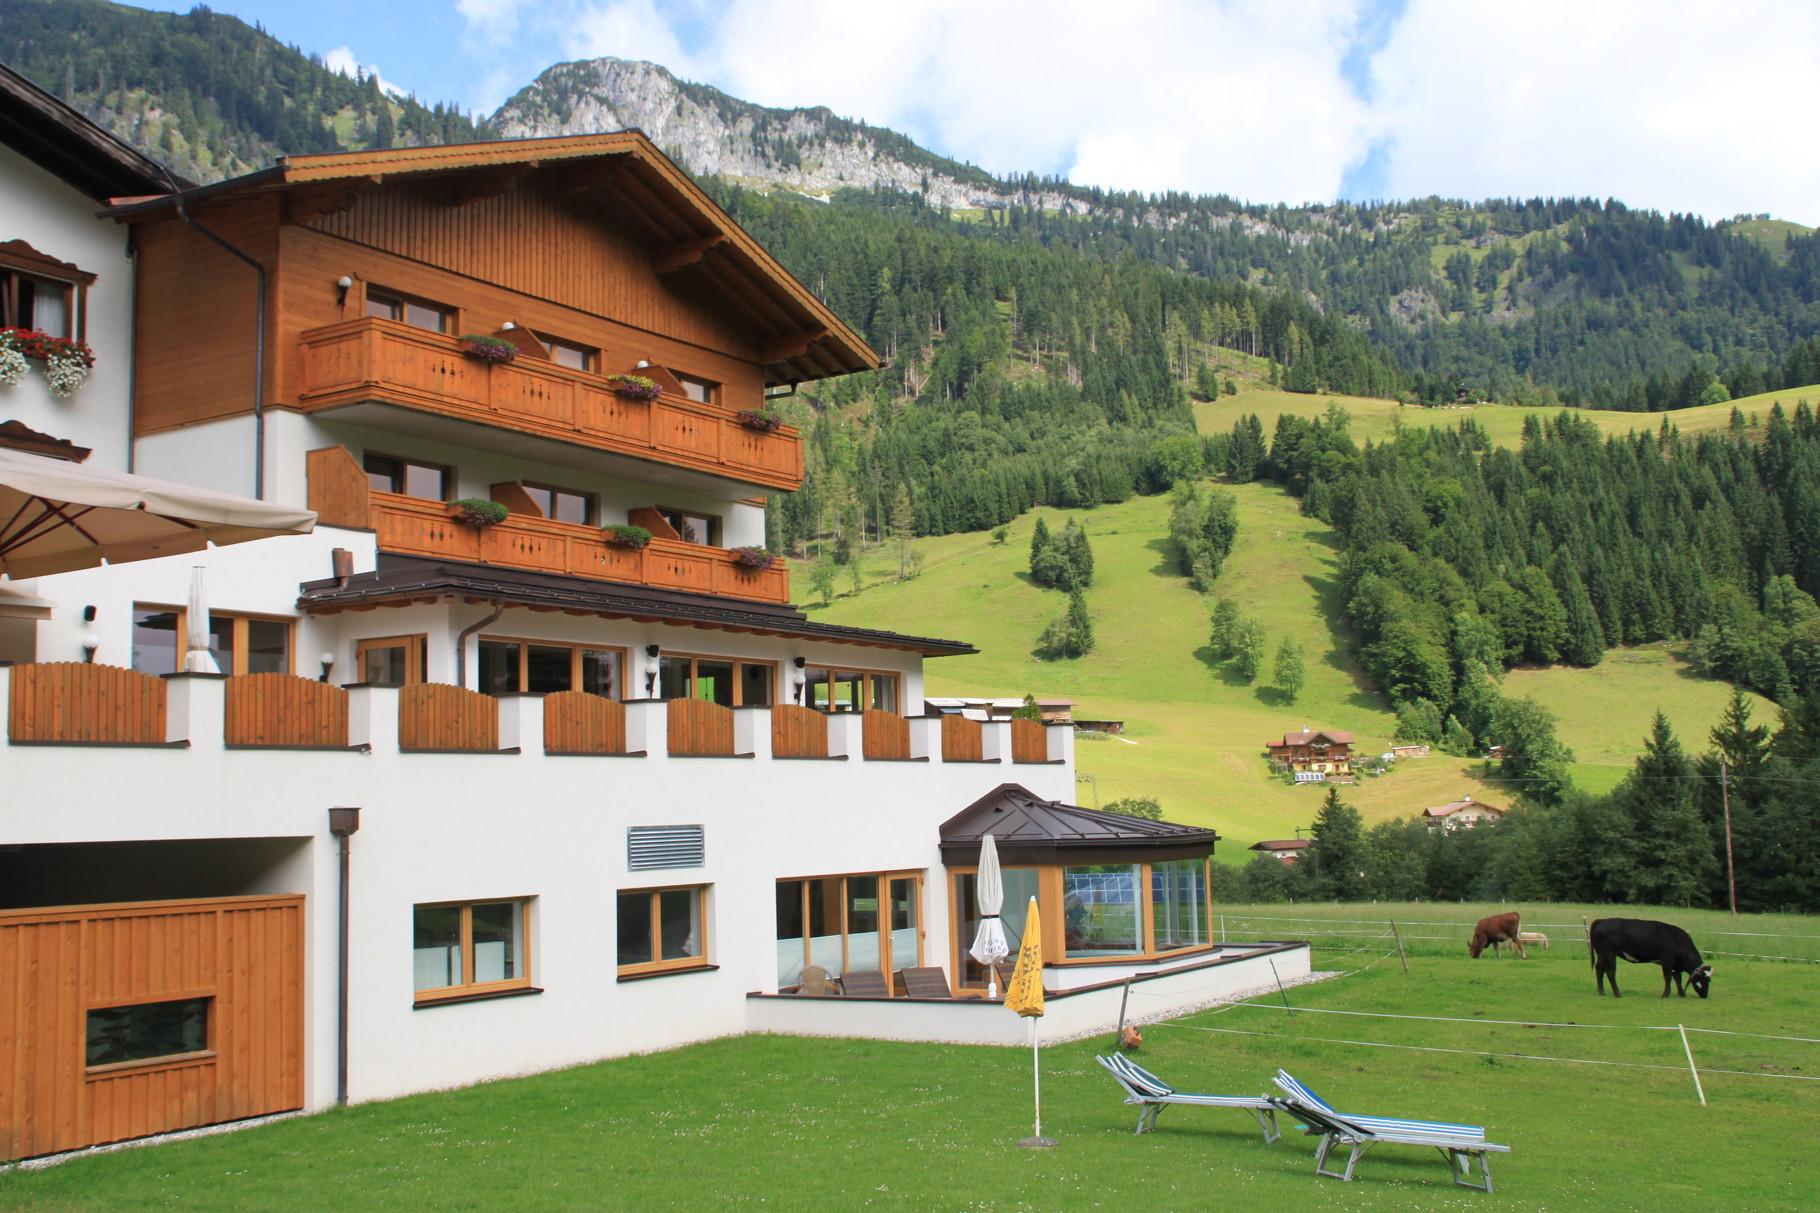 Alpengasthof mit kleinem Panoramowhirlpool